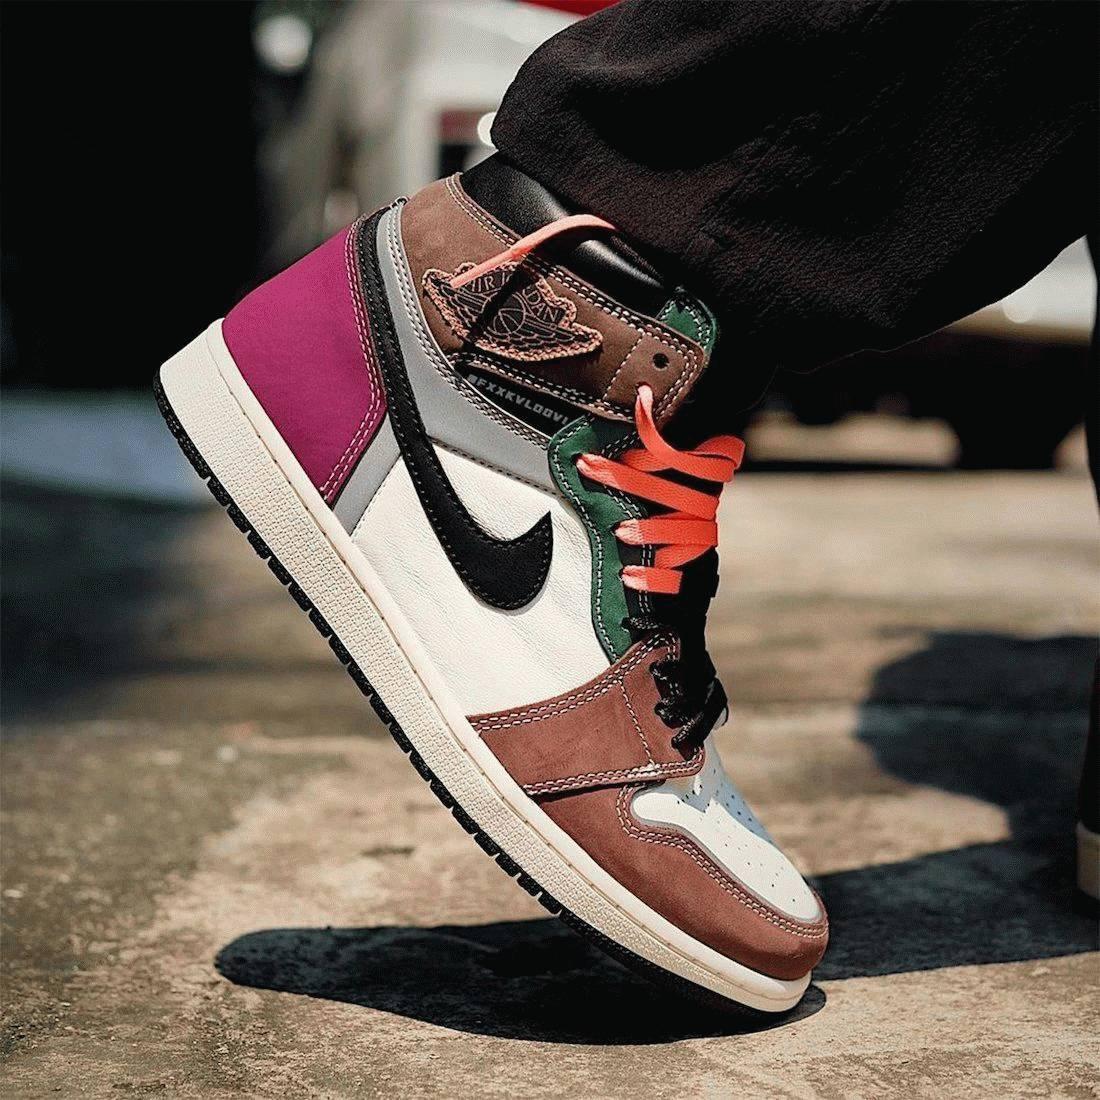 Air Jordan 1 High OG Handcrafted on feet look